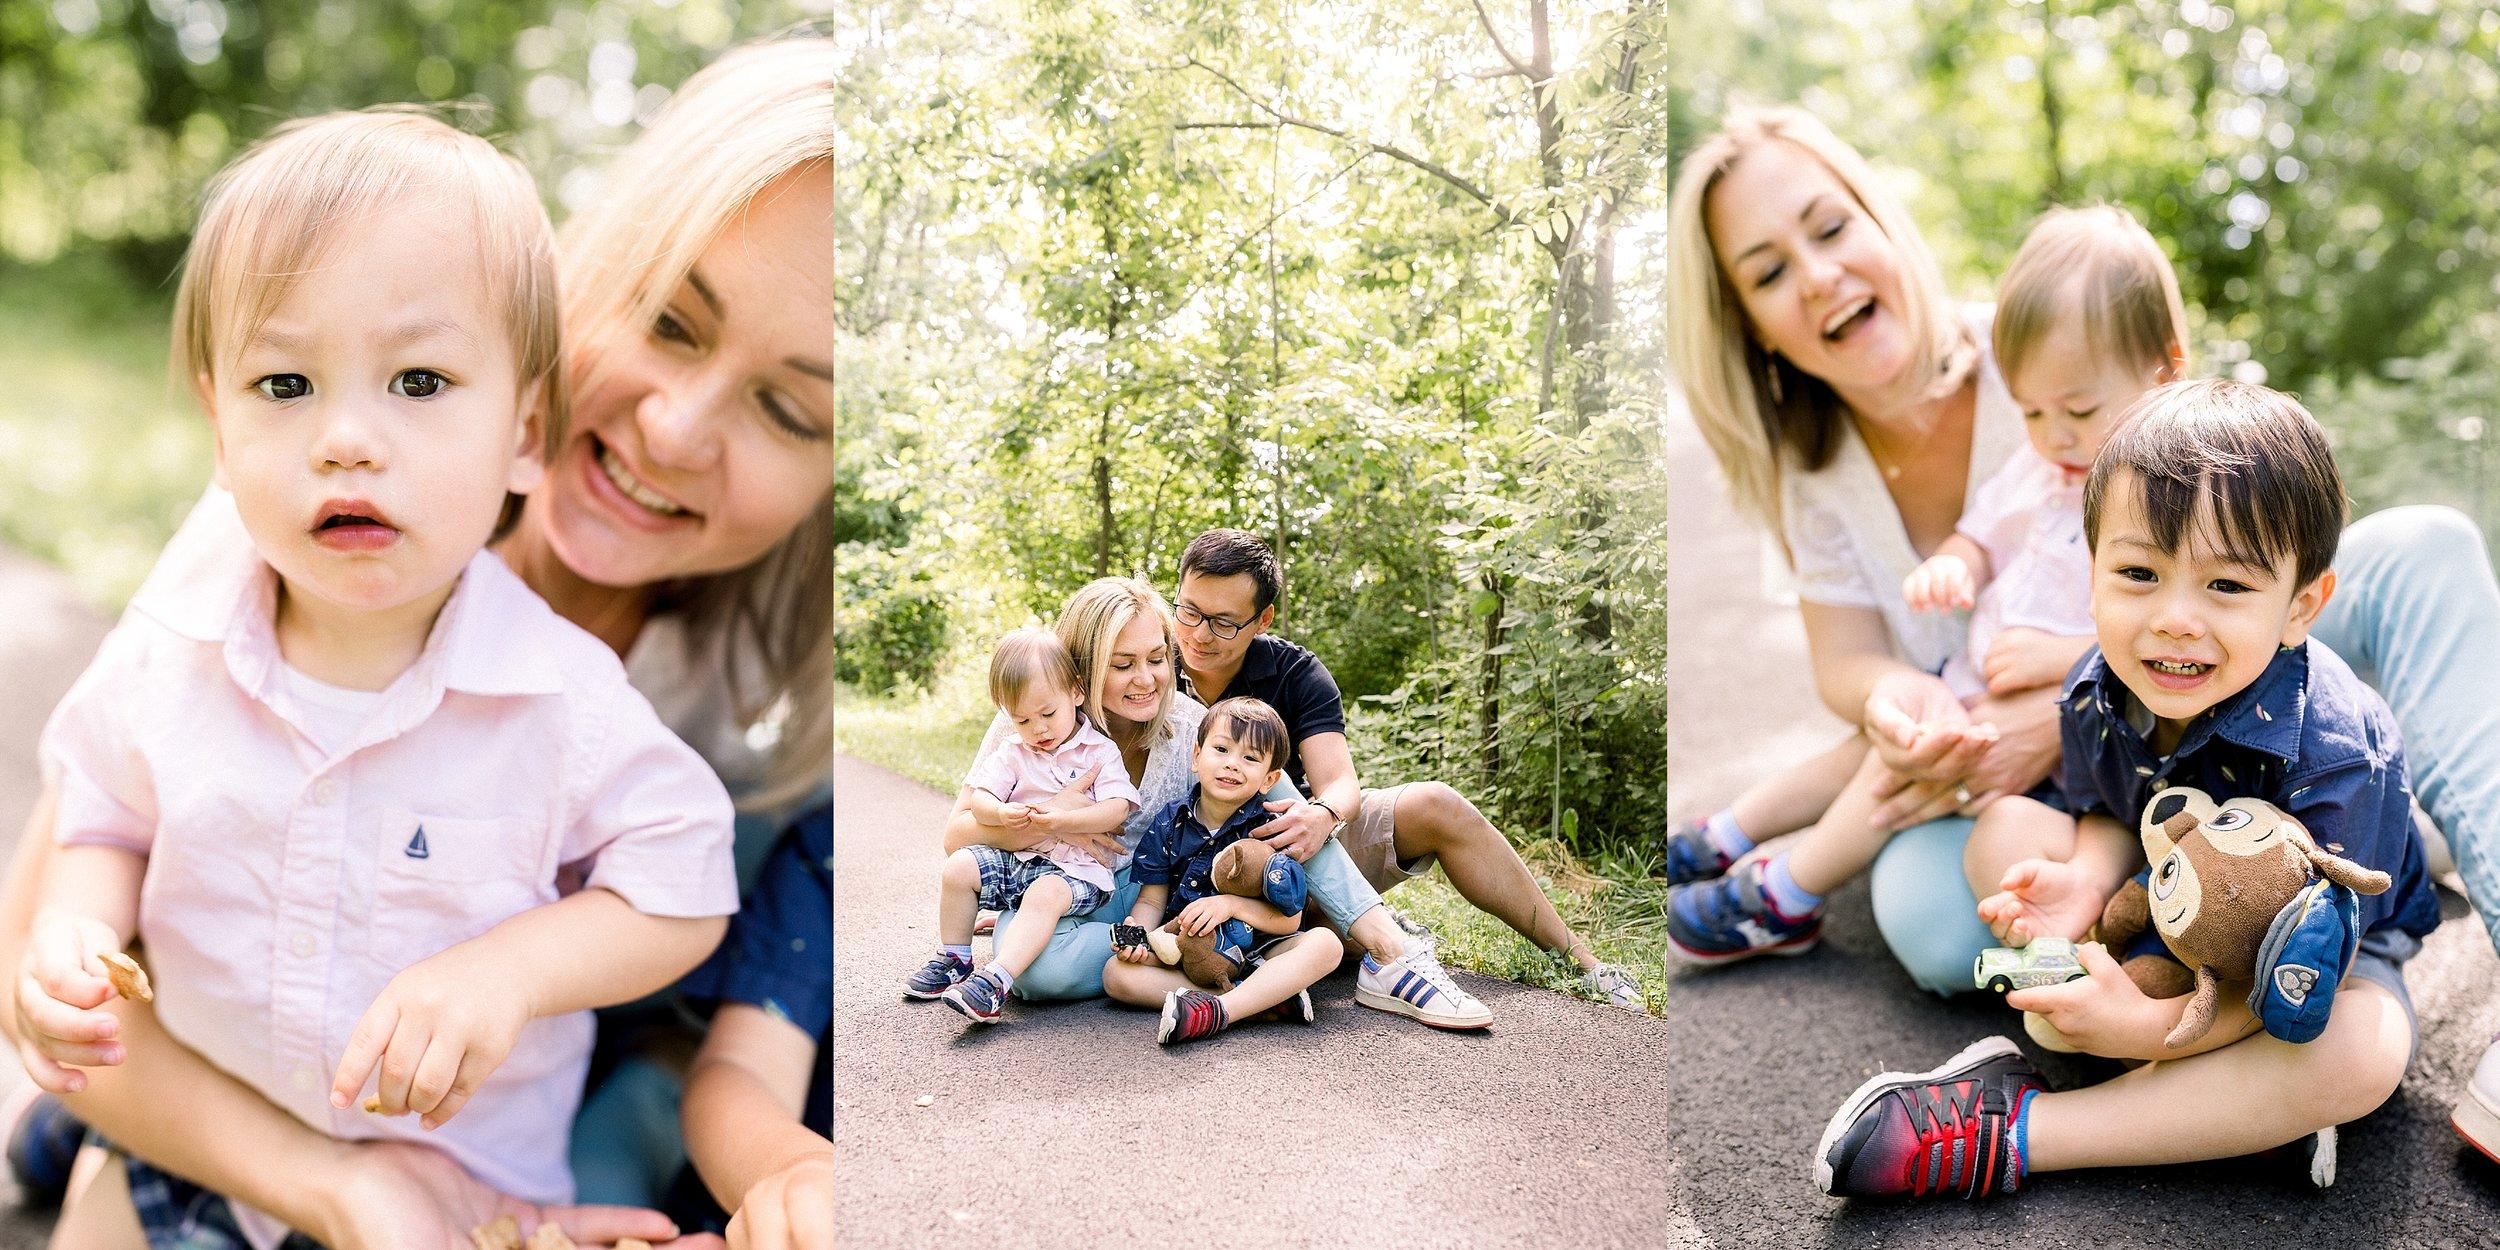 Bucks-County-Family-Photographer_0010-1.jpg